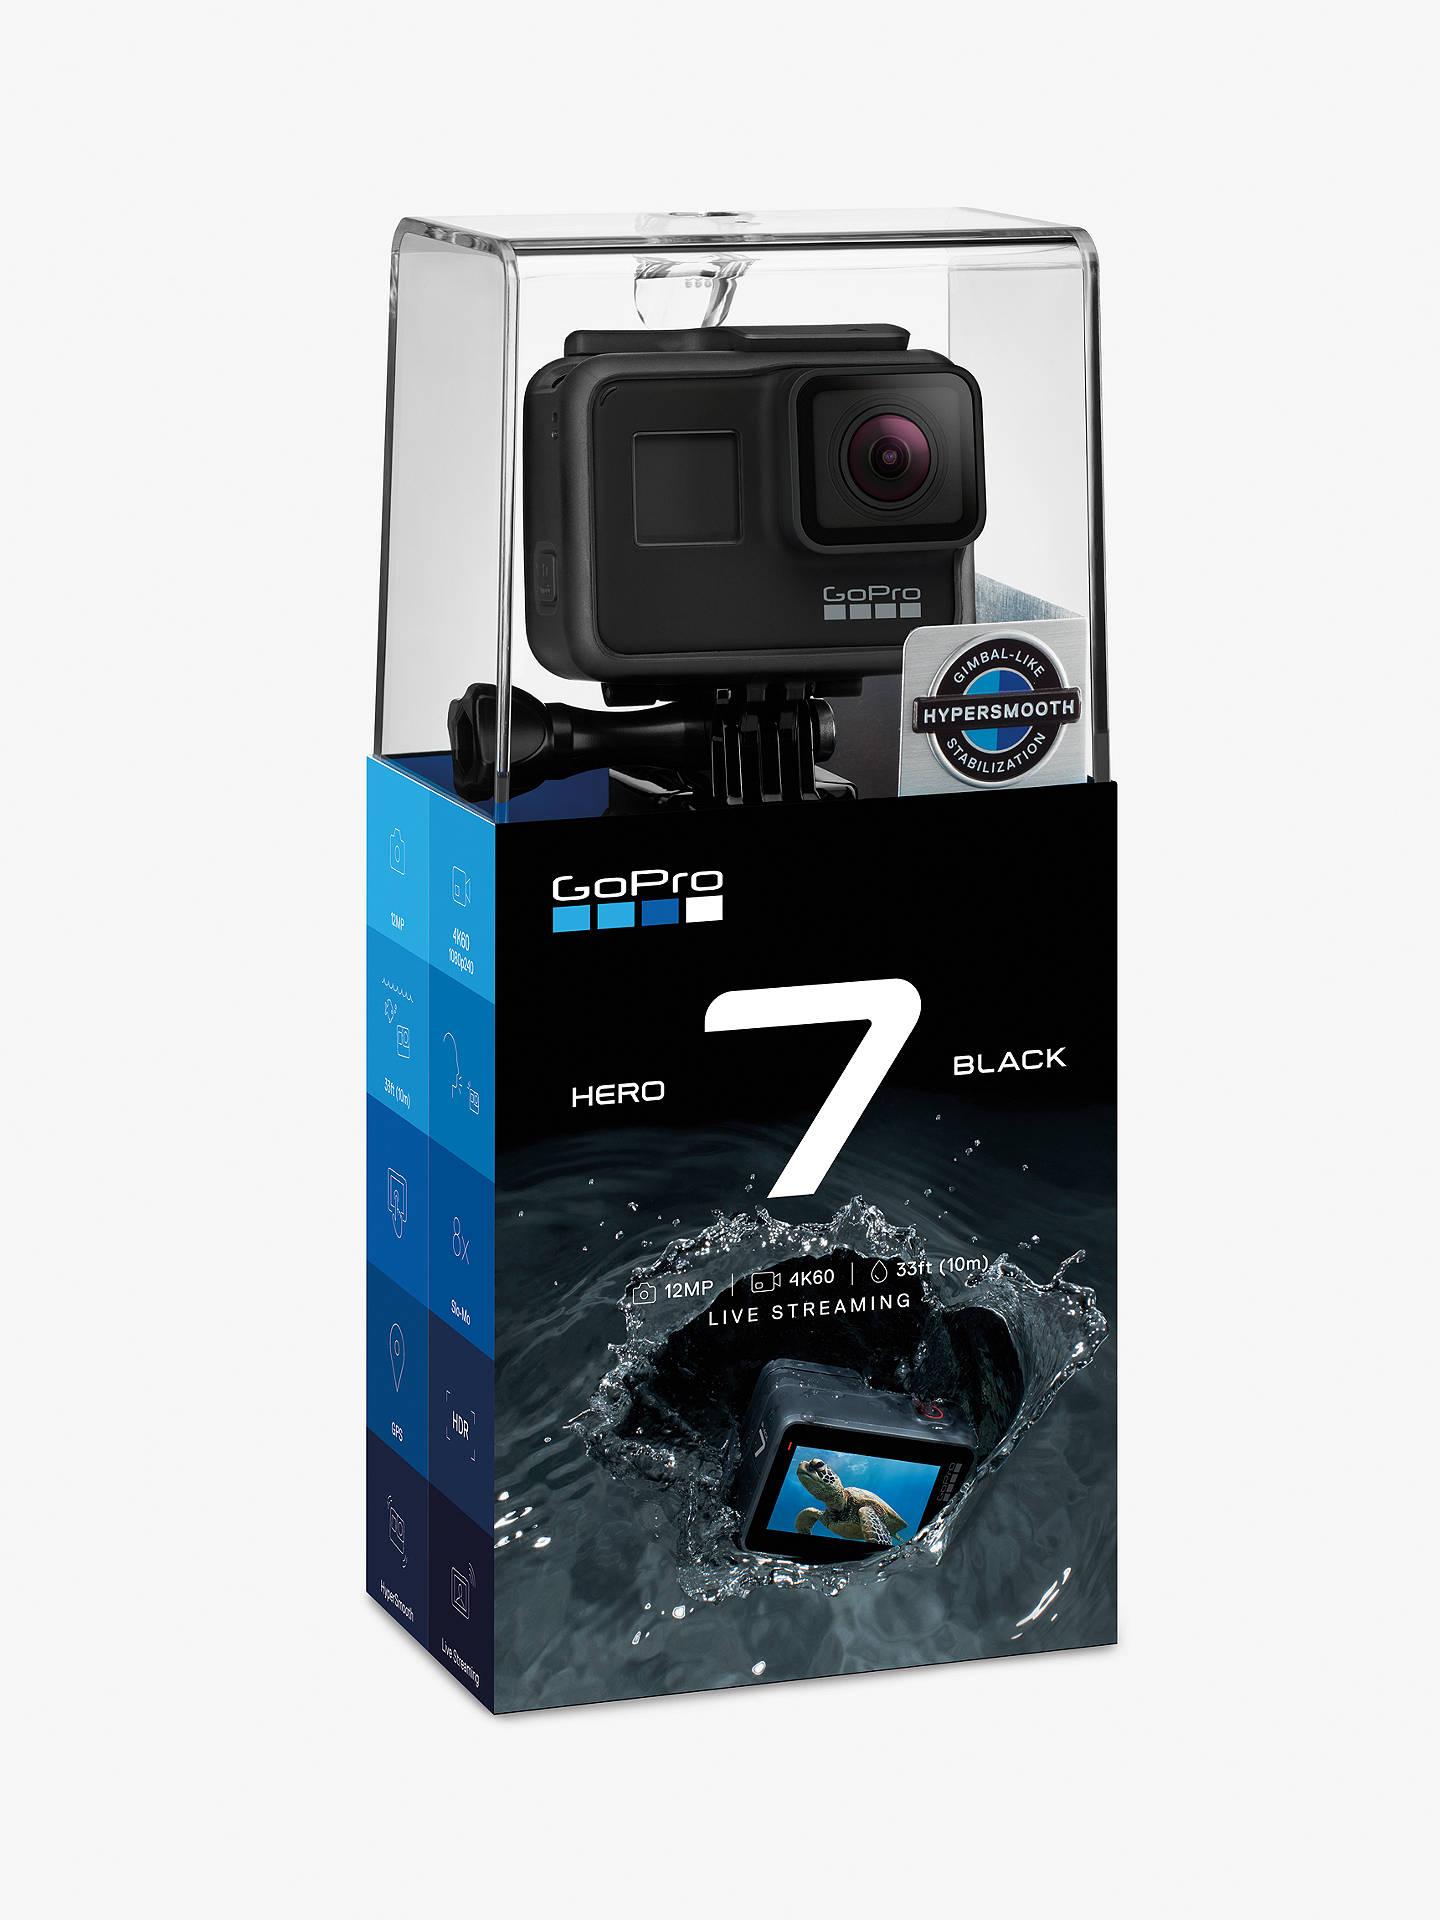 GoPro HERO7 Black Camcorder, 4K Ultra HD, 60 FPS, 12MP, Wi-Fi